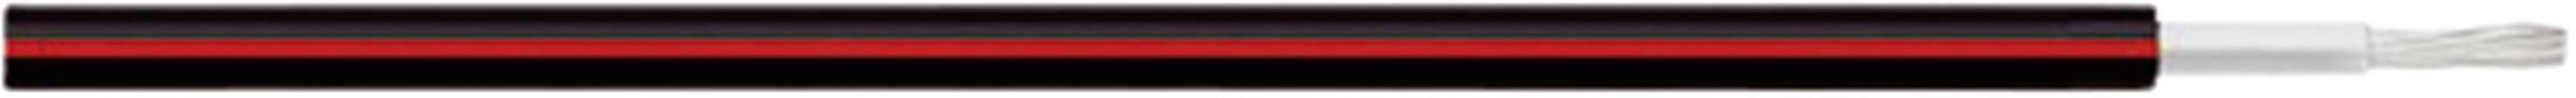 Fotovoltaický kabel ÖLFLEX® SOLAR XLR-R 1 x 2.50 mm² černá, červená LappKabel 0023390 500 m